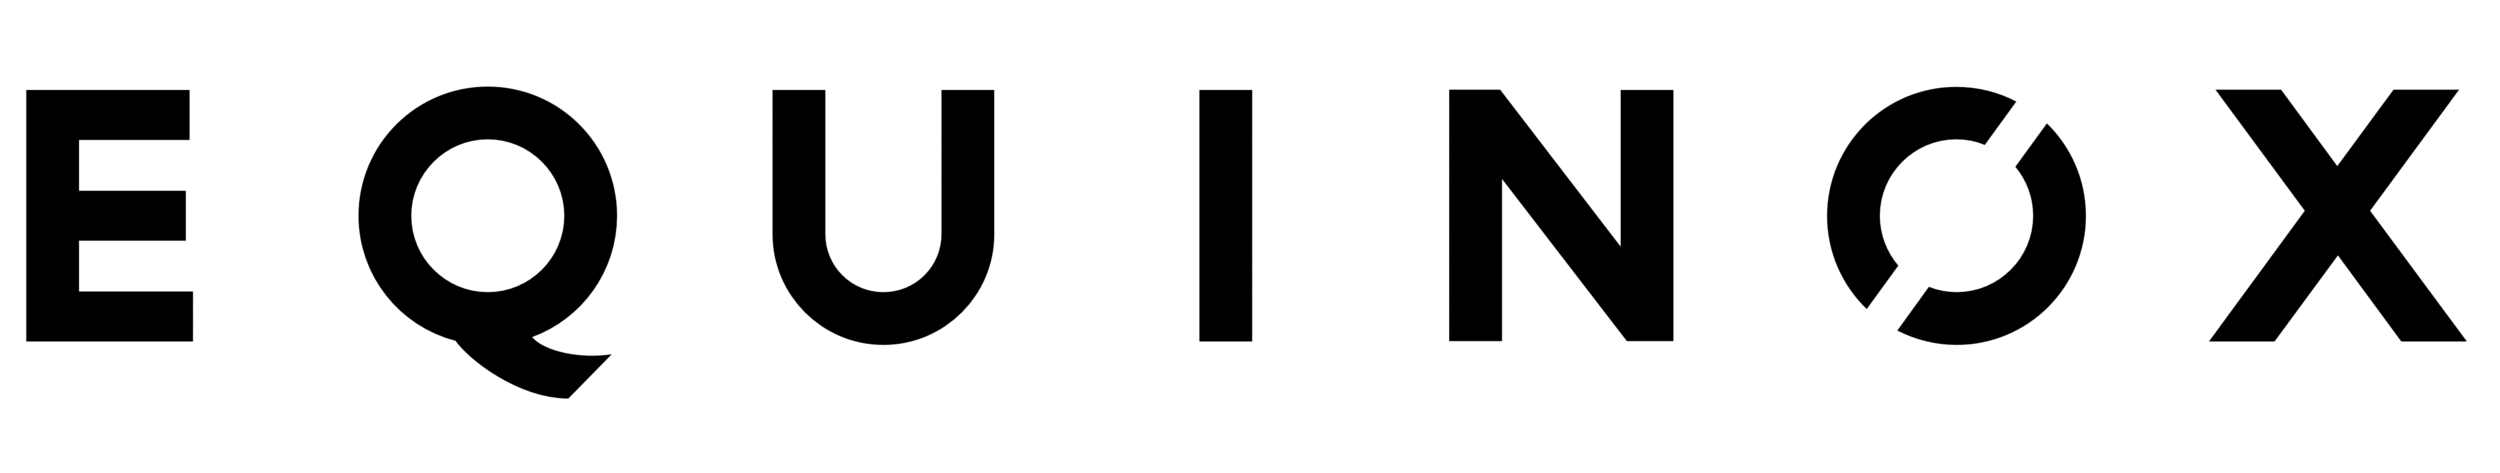 Equinox_Fitness_logo.png